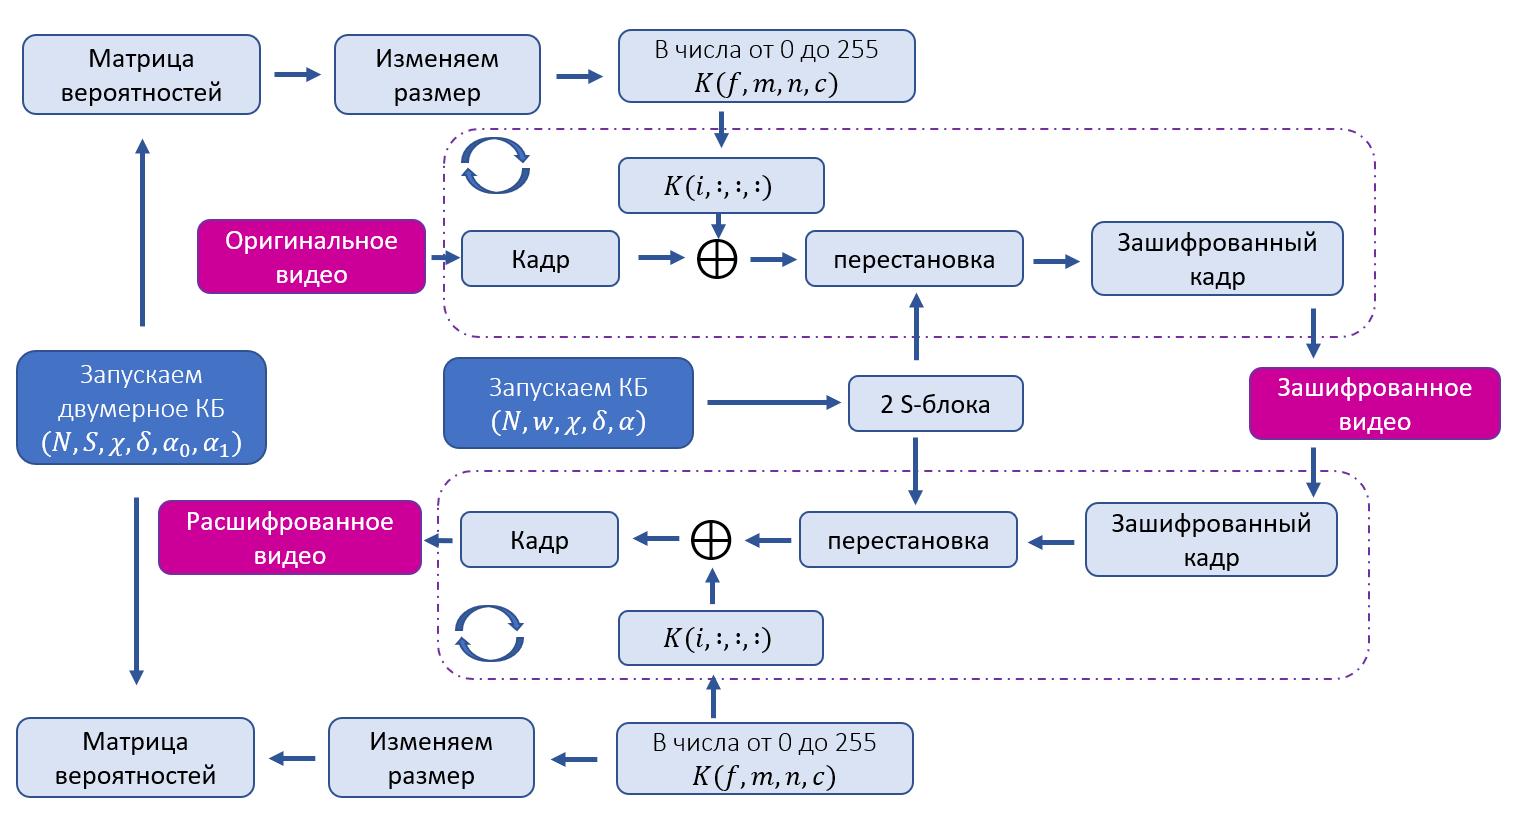 Схема шифрования и расшифрования видео